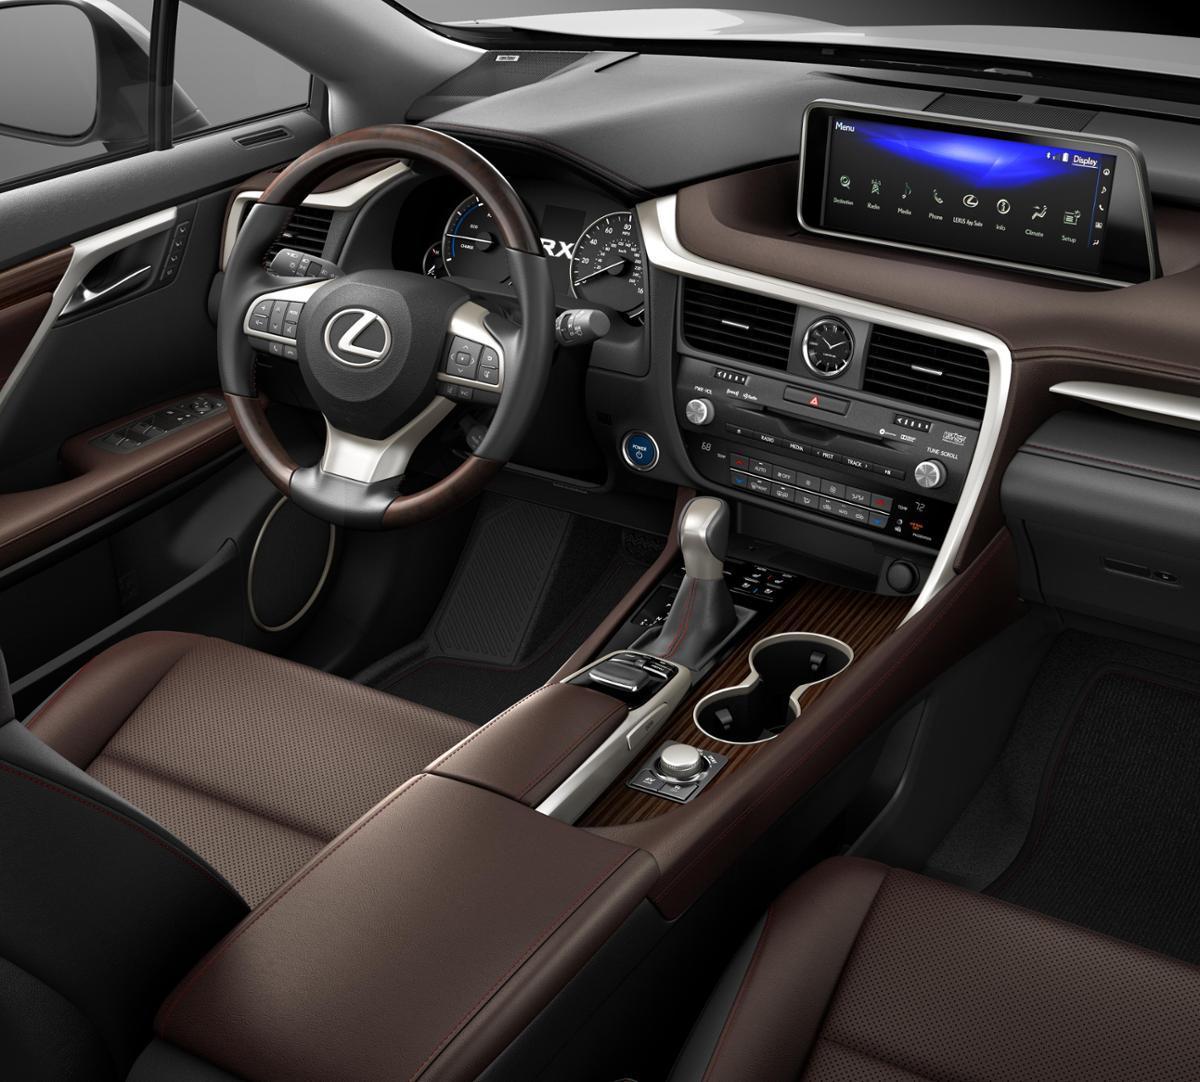 2019 Lexus Rx Hybrid: New 2019 Lexus RX 450h For Sale In Farmingdale, NY